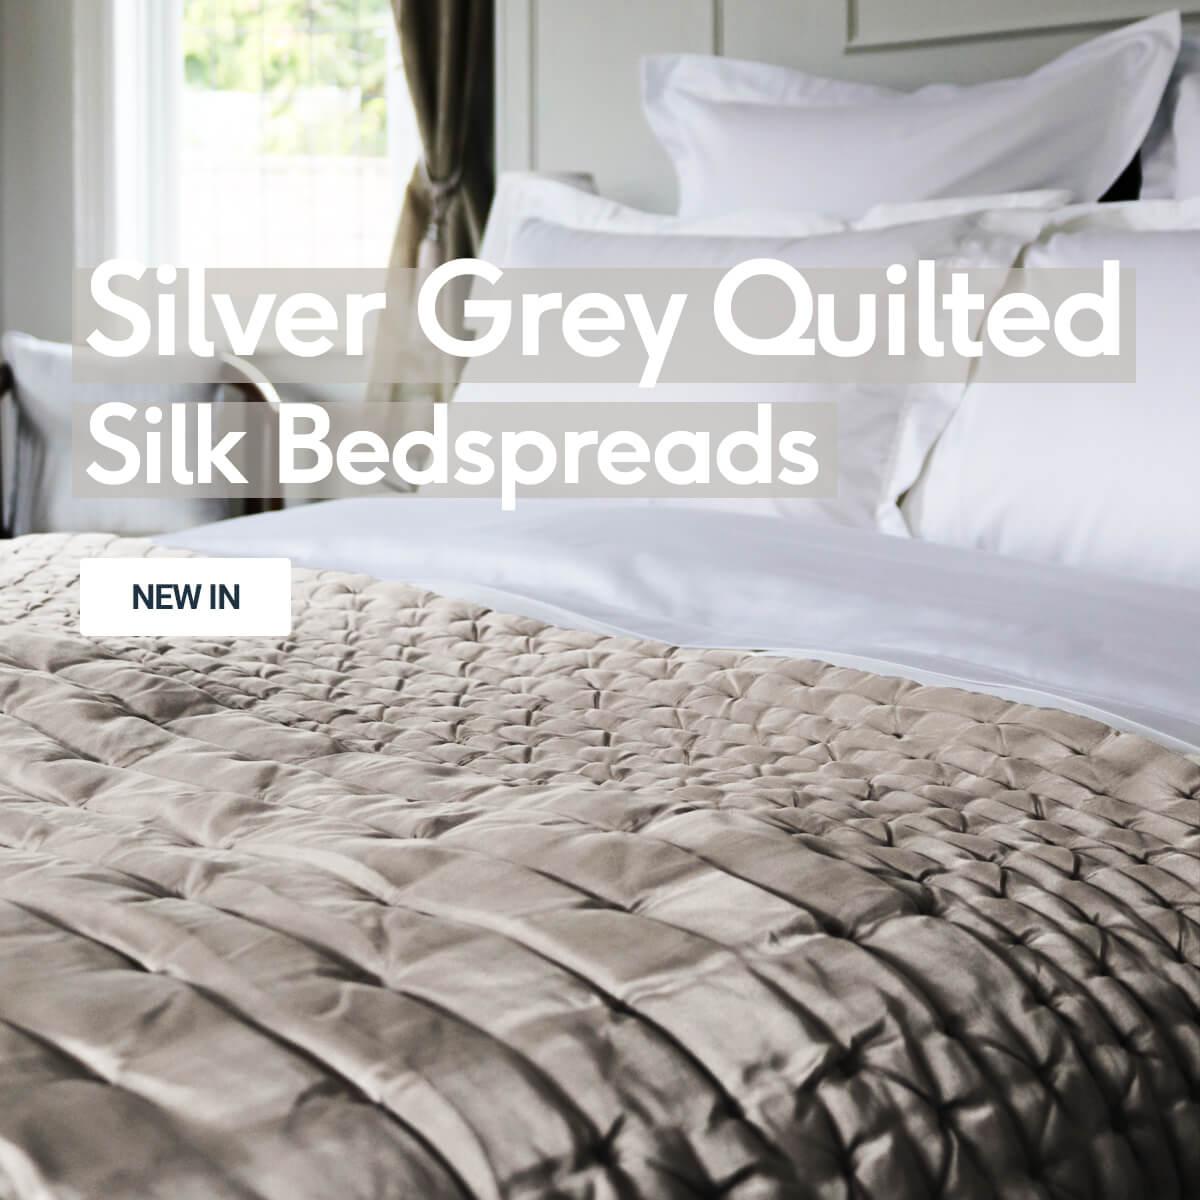 Silver Grey Quilted Silk Bedspread